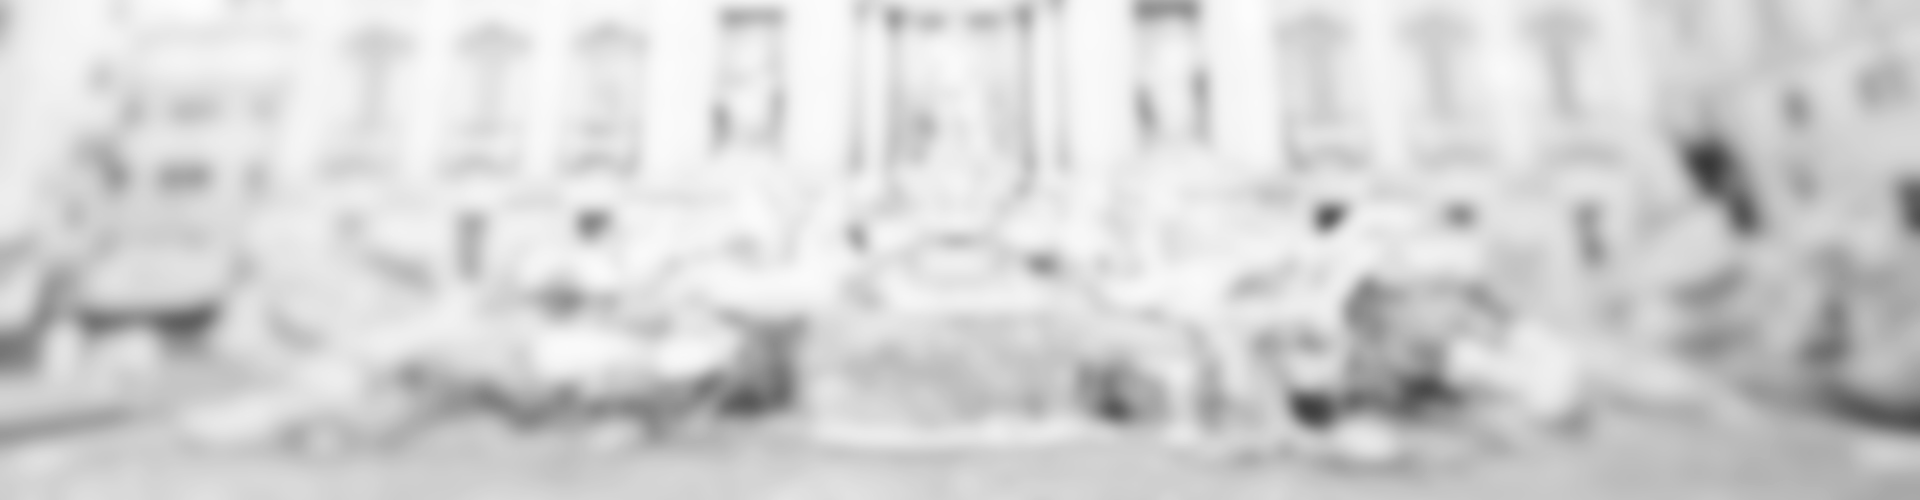 wallpaper-trevi-fountain-rome-italy